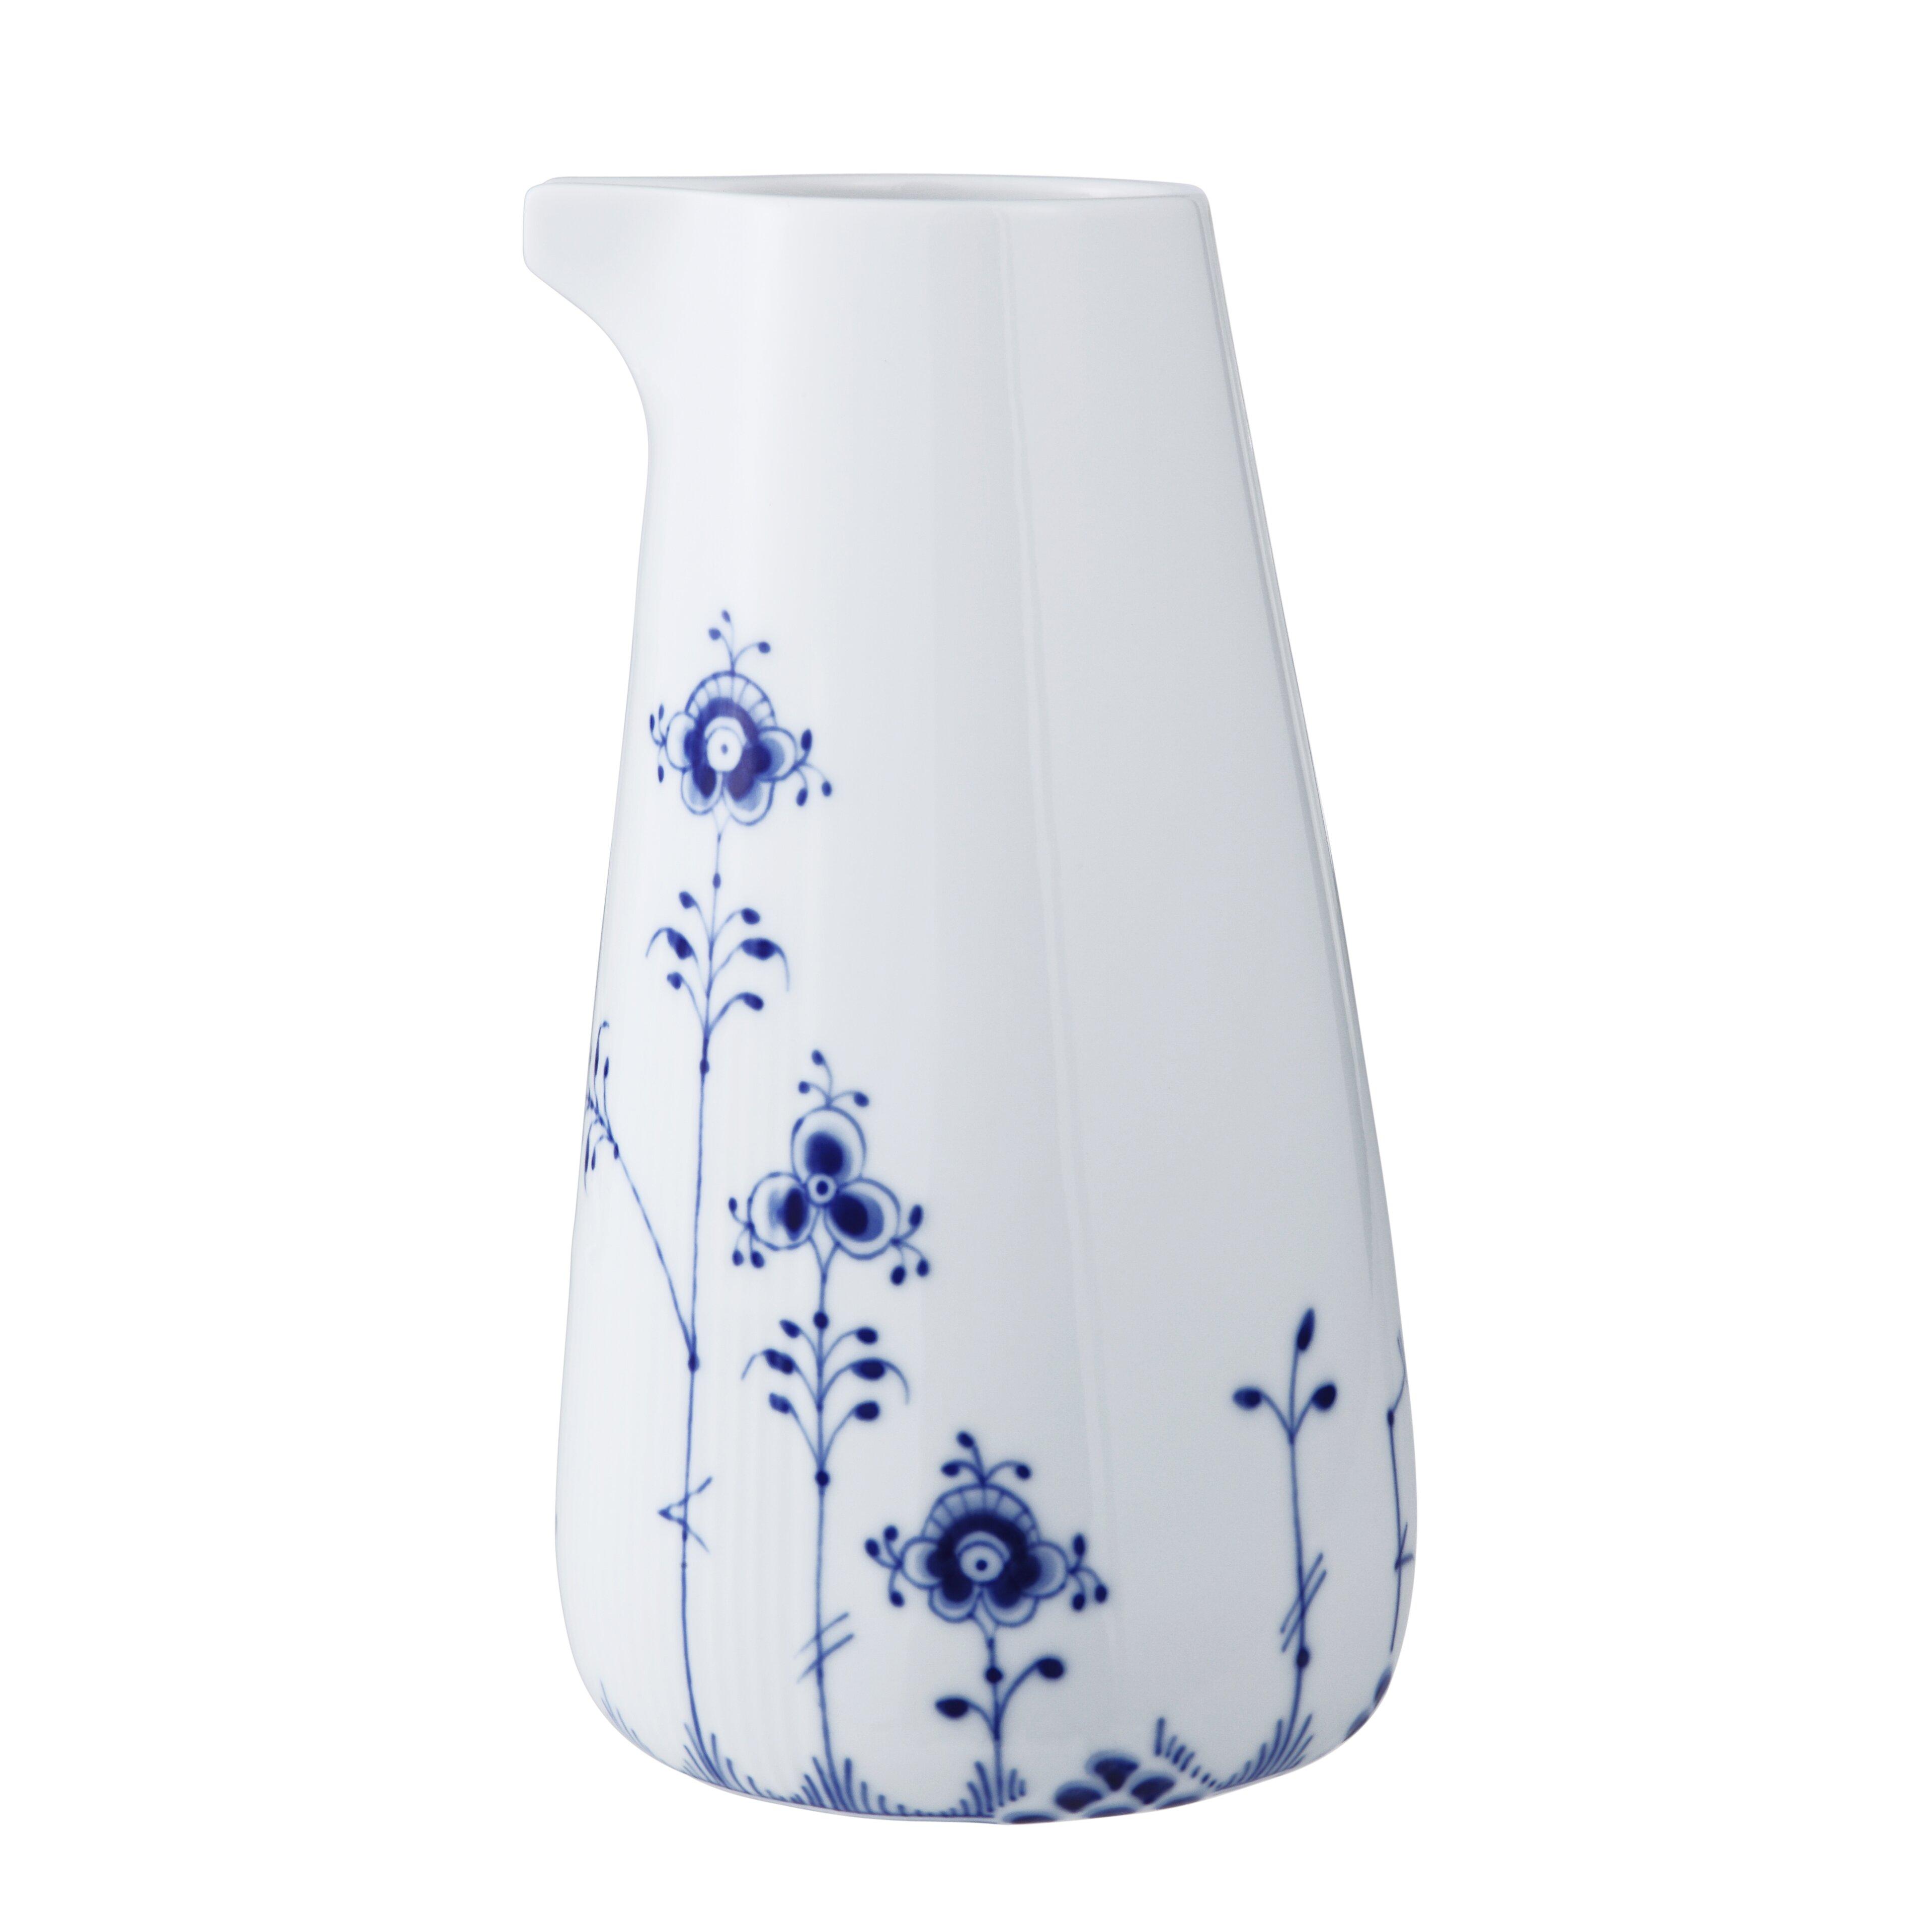 royal copenhagen blue elements 24 oz jug wayfair. Black Bedroom Furniture Sets. Home Design Ideas